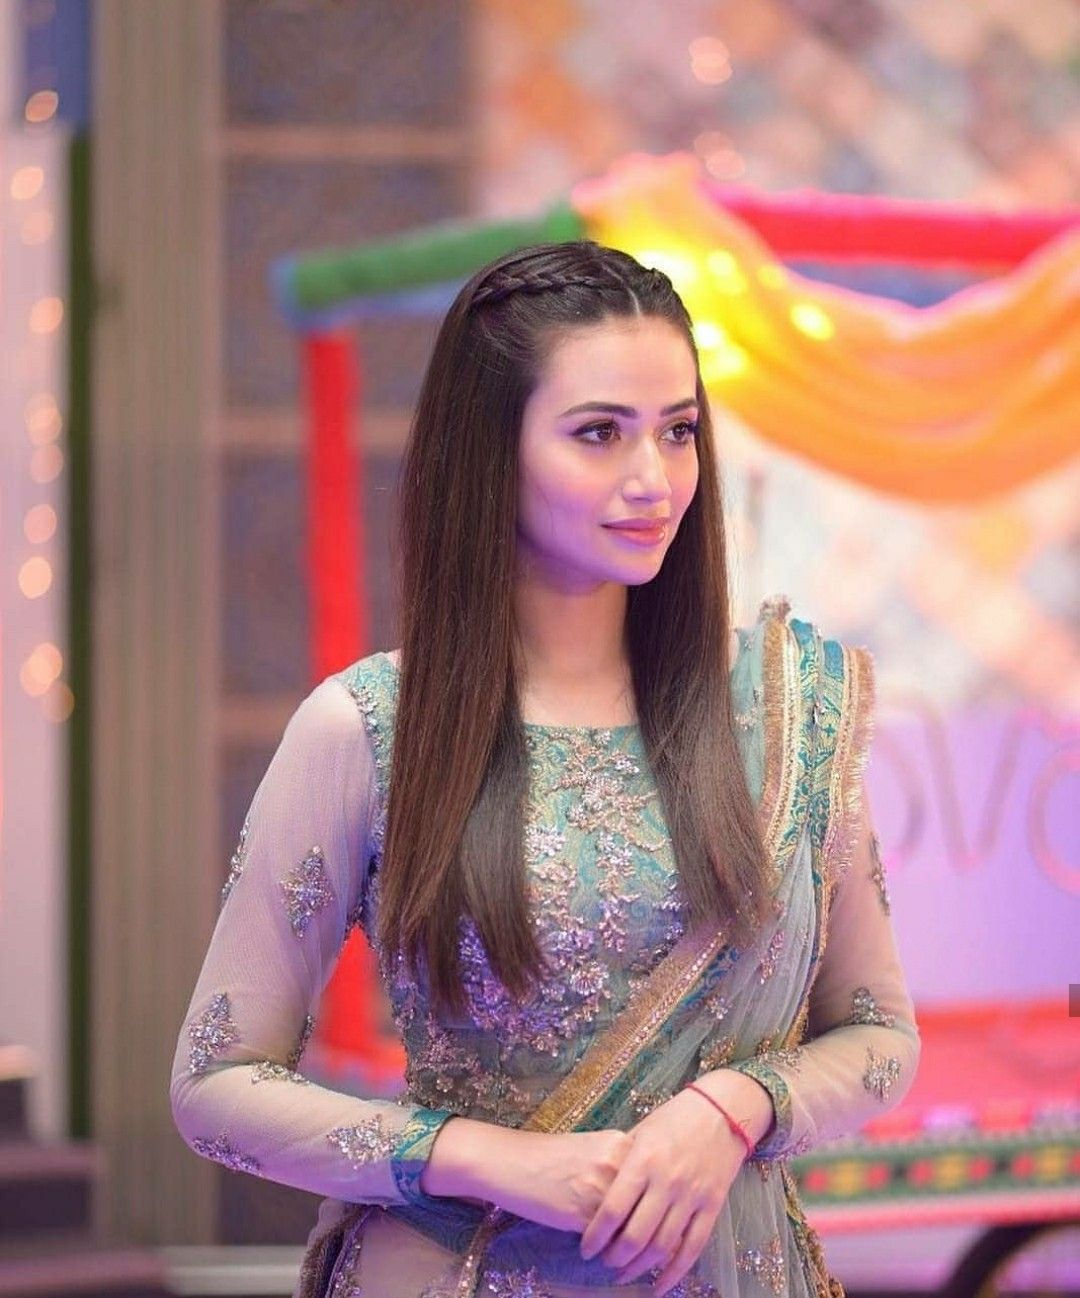 Pakistani Actress Hairstyles: Pakistani Actress Hairstyle